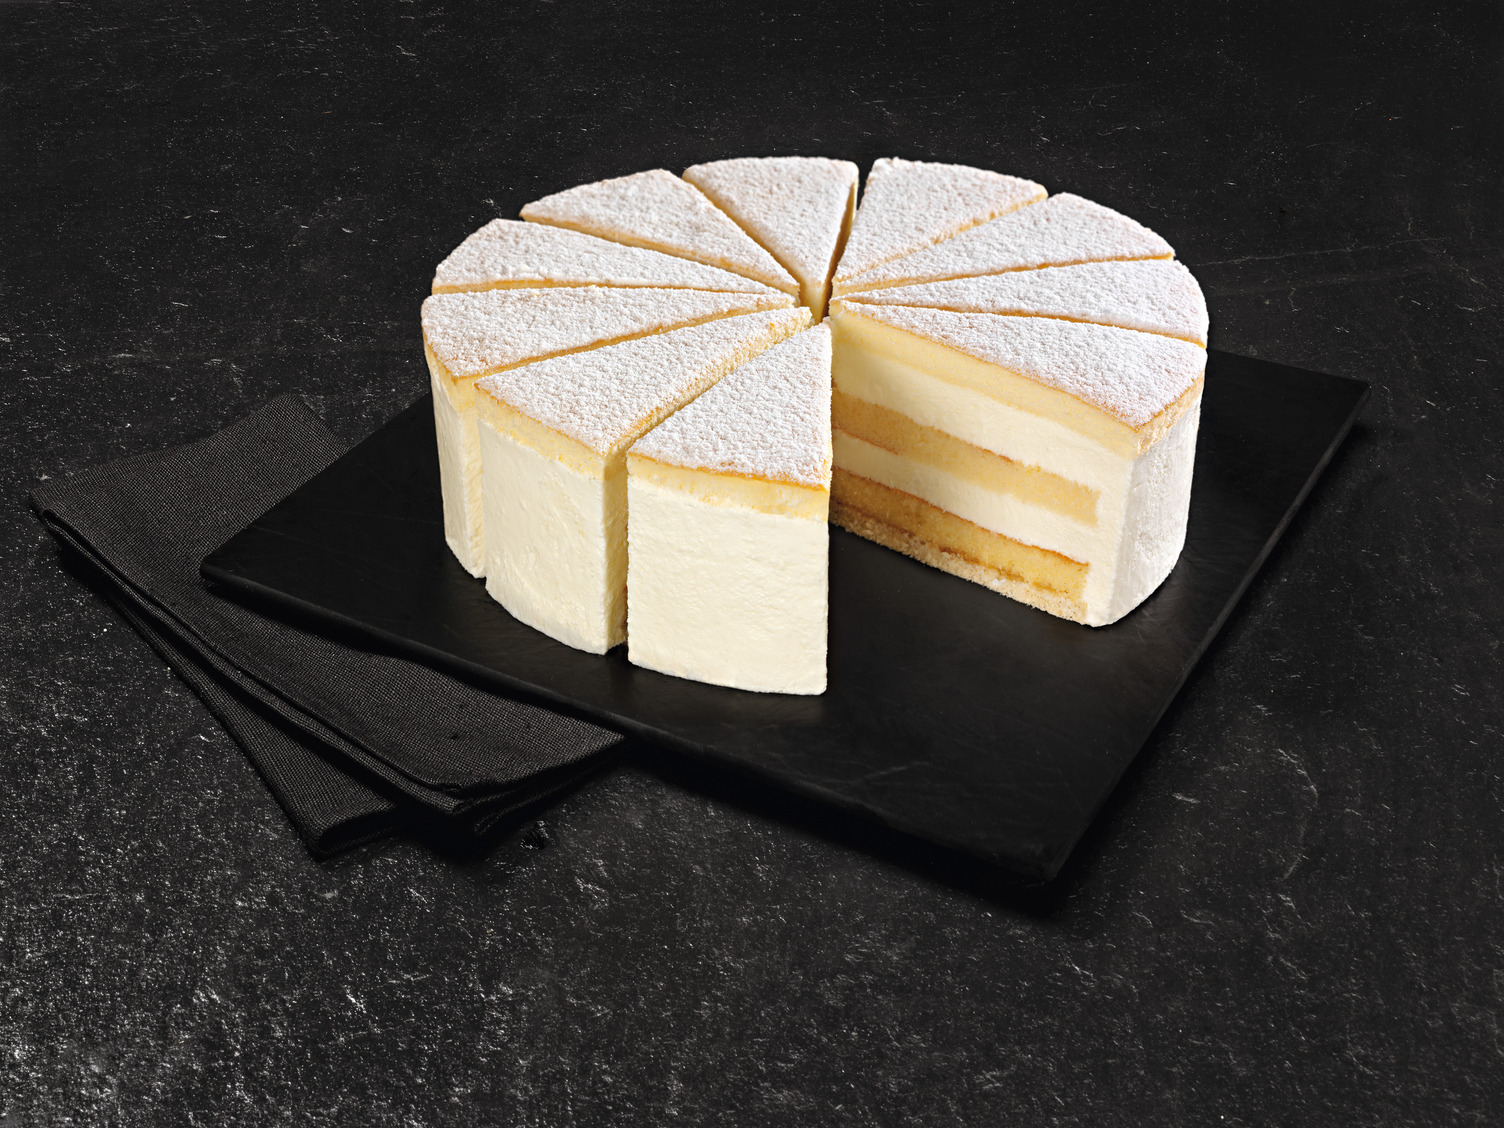 NESTLE SCHOELLER Backwaren UNSERE PRACHTSTÜCKE CLASSICS Käse Sahne Torte vorgeschnitten 1650 g